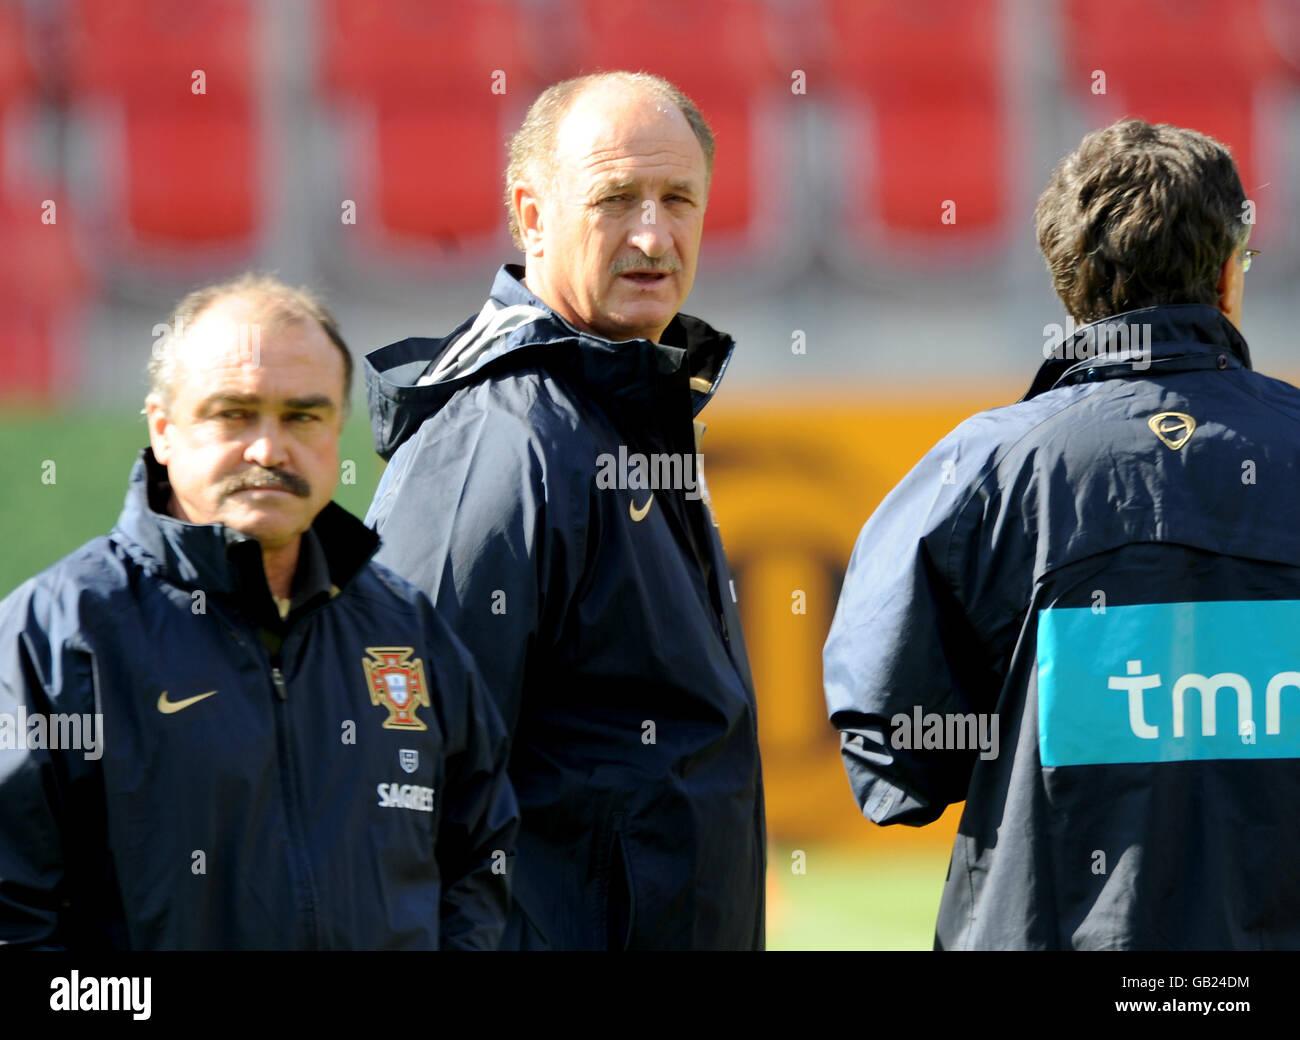 Fußball - UEFA European Championship 2008 - Gruppe A - Portugal-Pressekonferenz und Training - Stade La Maladiere Stockbild